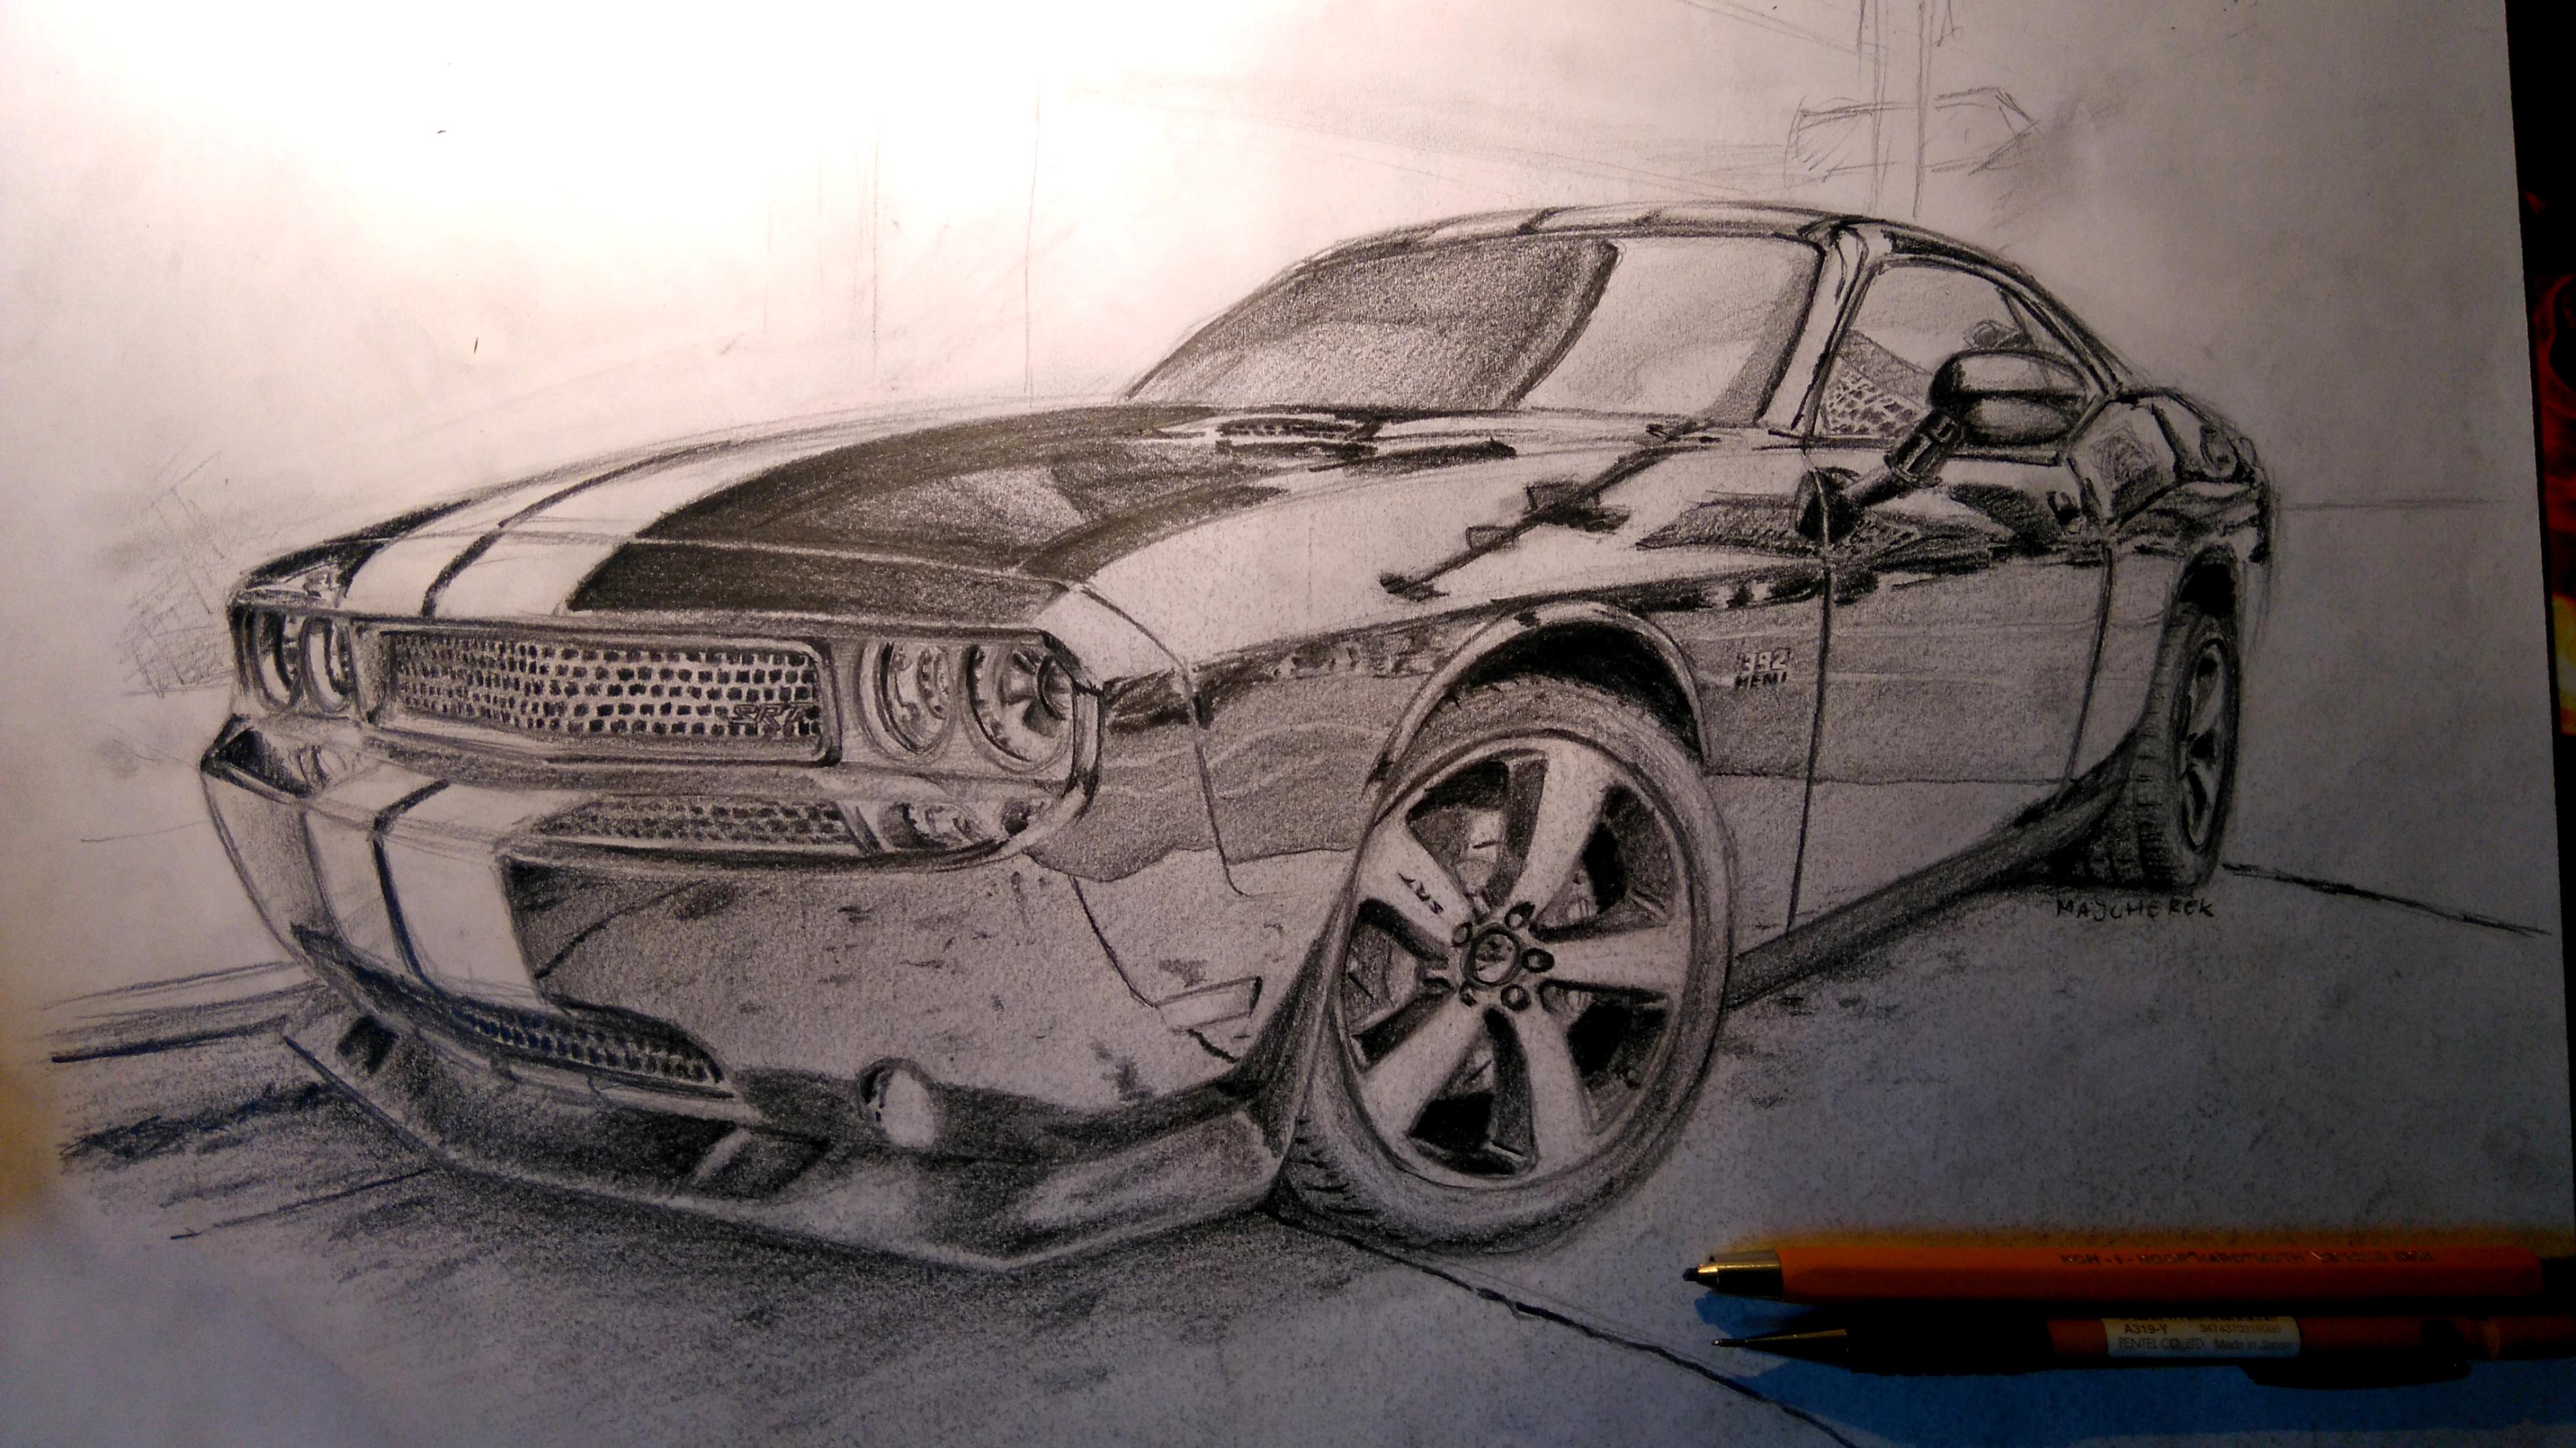 3920x2204 Dodge Challenger Srt8 Pencil Drawing